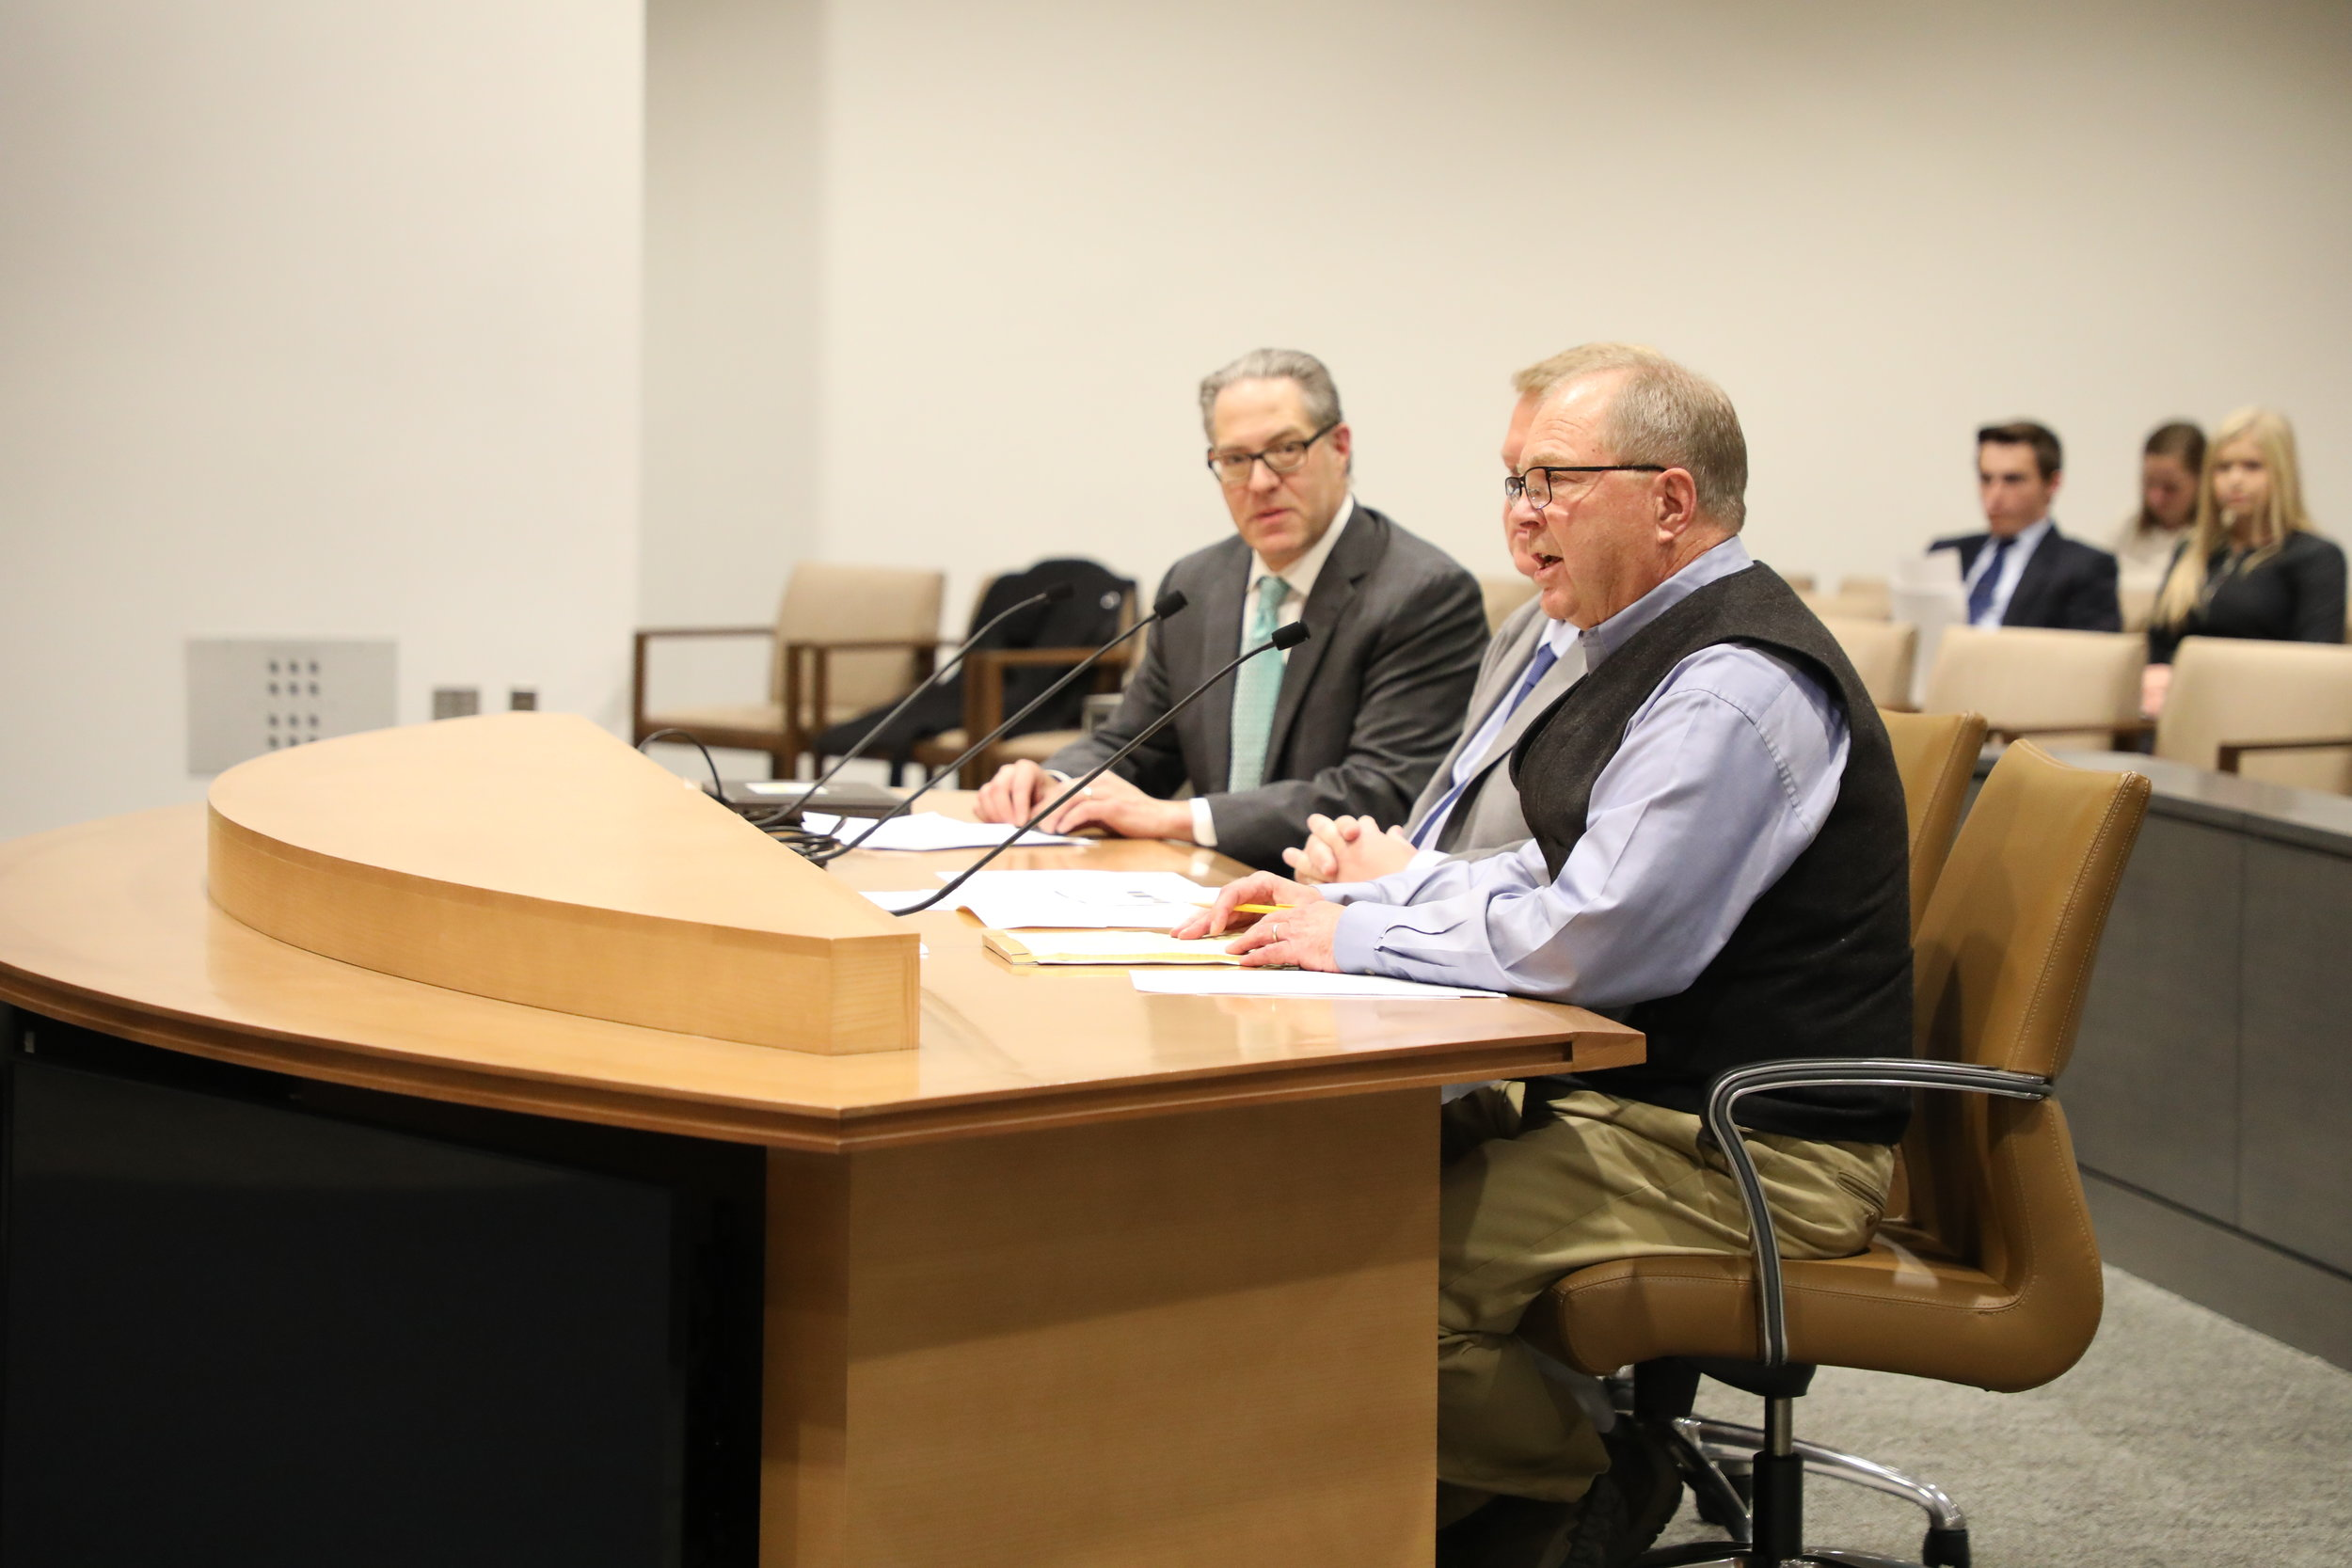 Lowell Pratt, Pratt Homes, and David Siegel, Housing First Minnesota Executive Director join Senator Rich Draheim in discussing SF3430 with the Senate Jobs Committee on Wednesday.